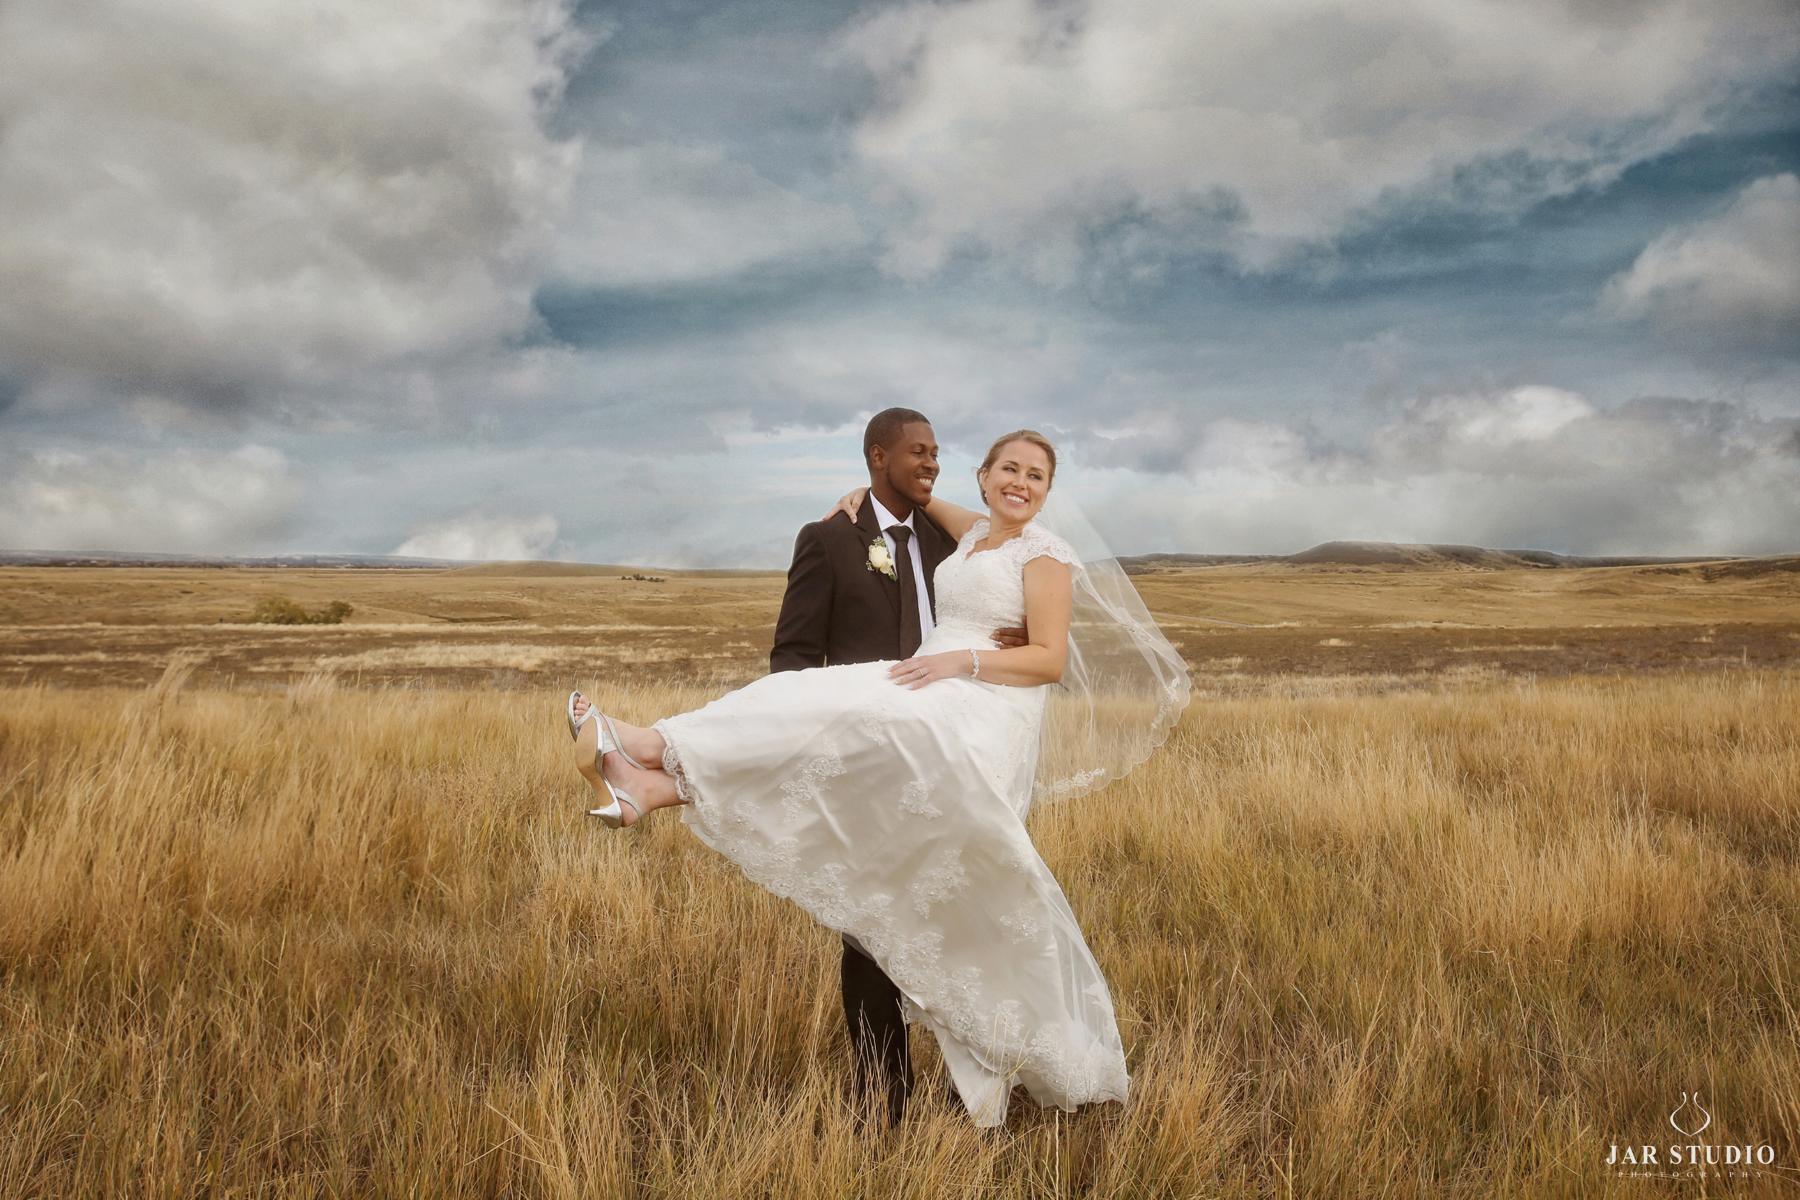 27-ideas-fun-couple-jarstudio-photography.jpg